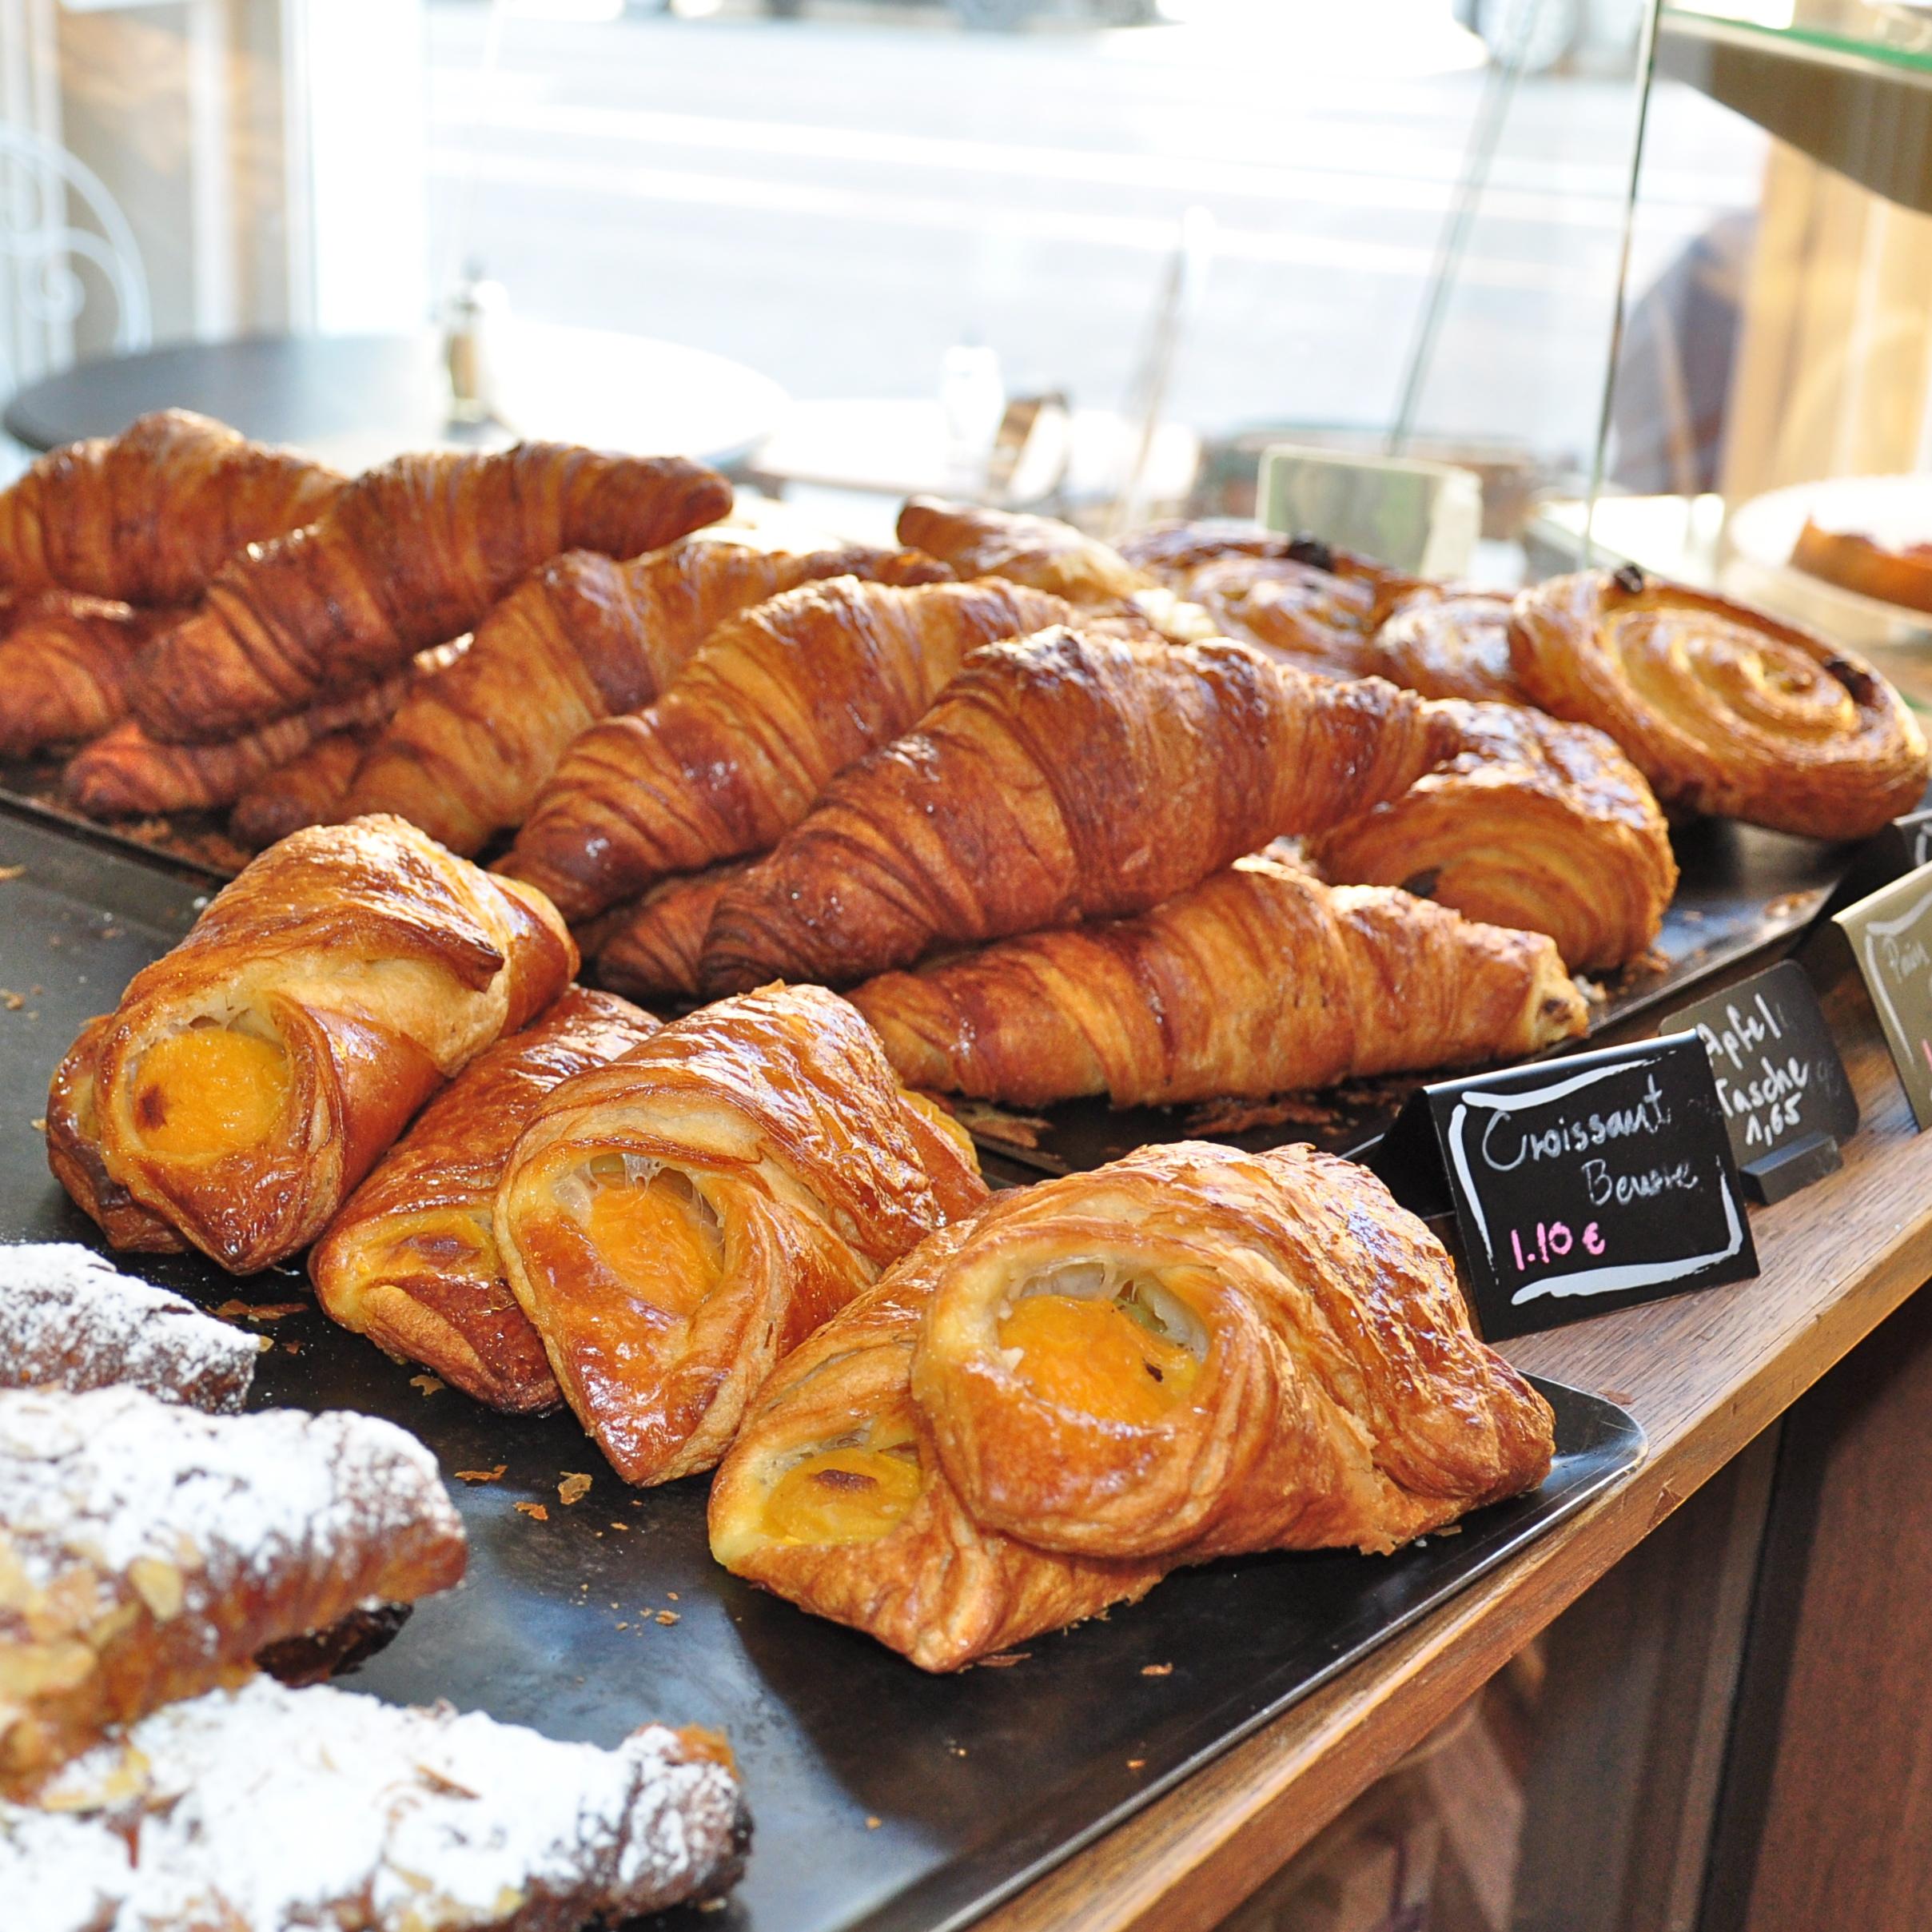 Les-Patisseries-de-Sebastien-Berlin-Croissants-Invalidenstraße